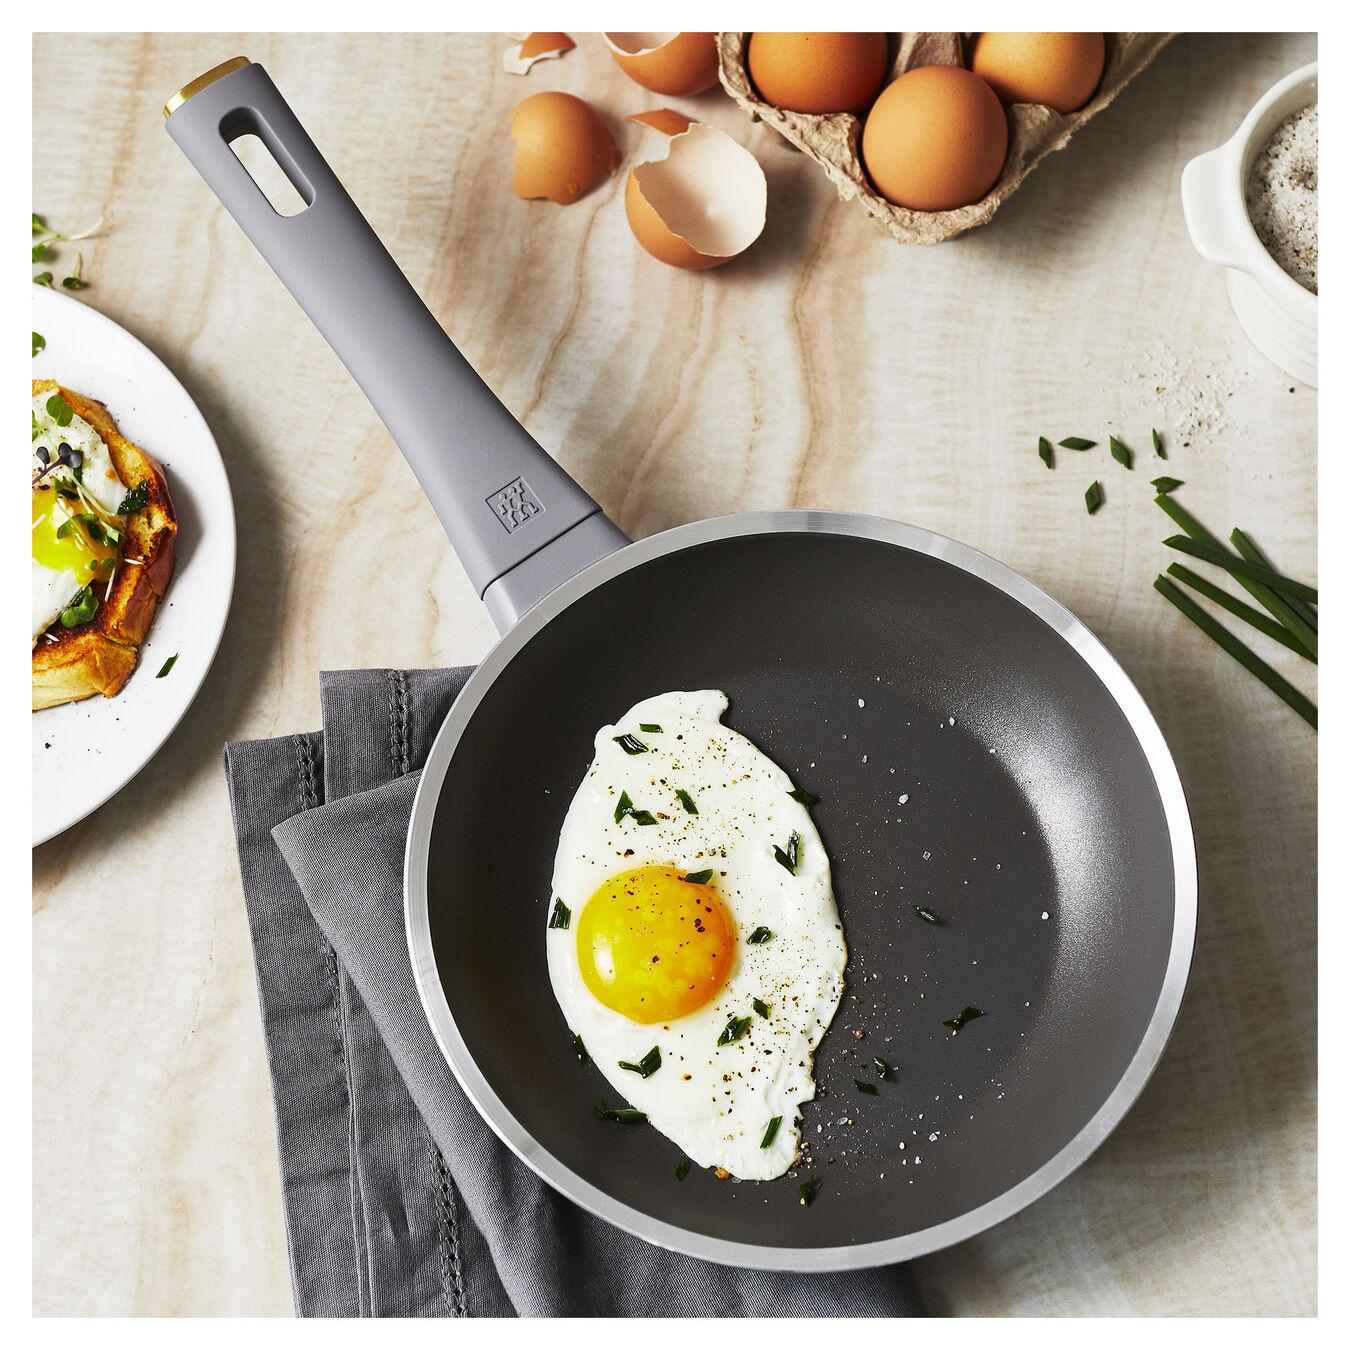 20 cm / 8 inch Frying pan,,large 8